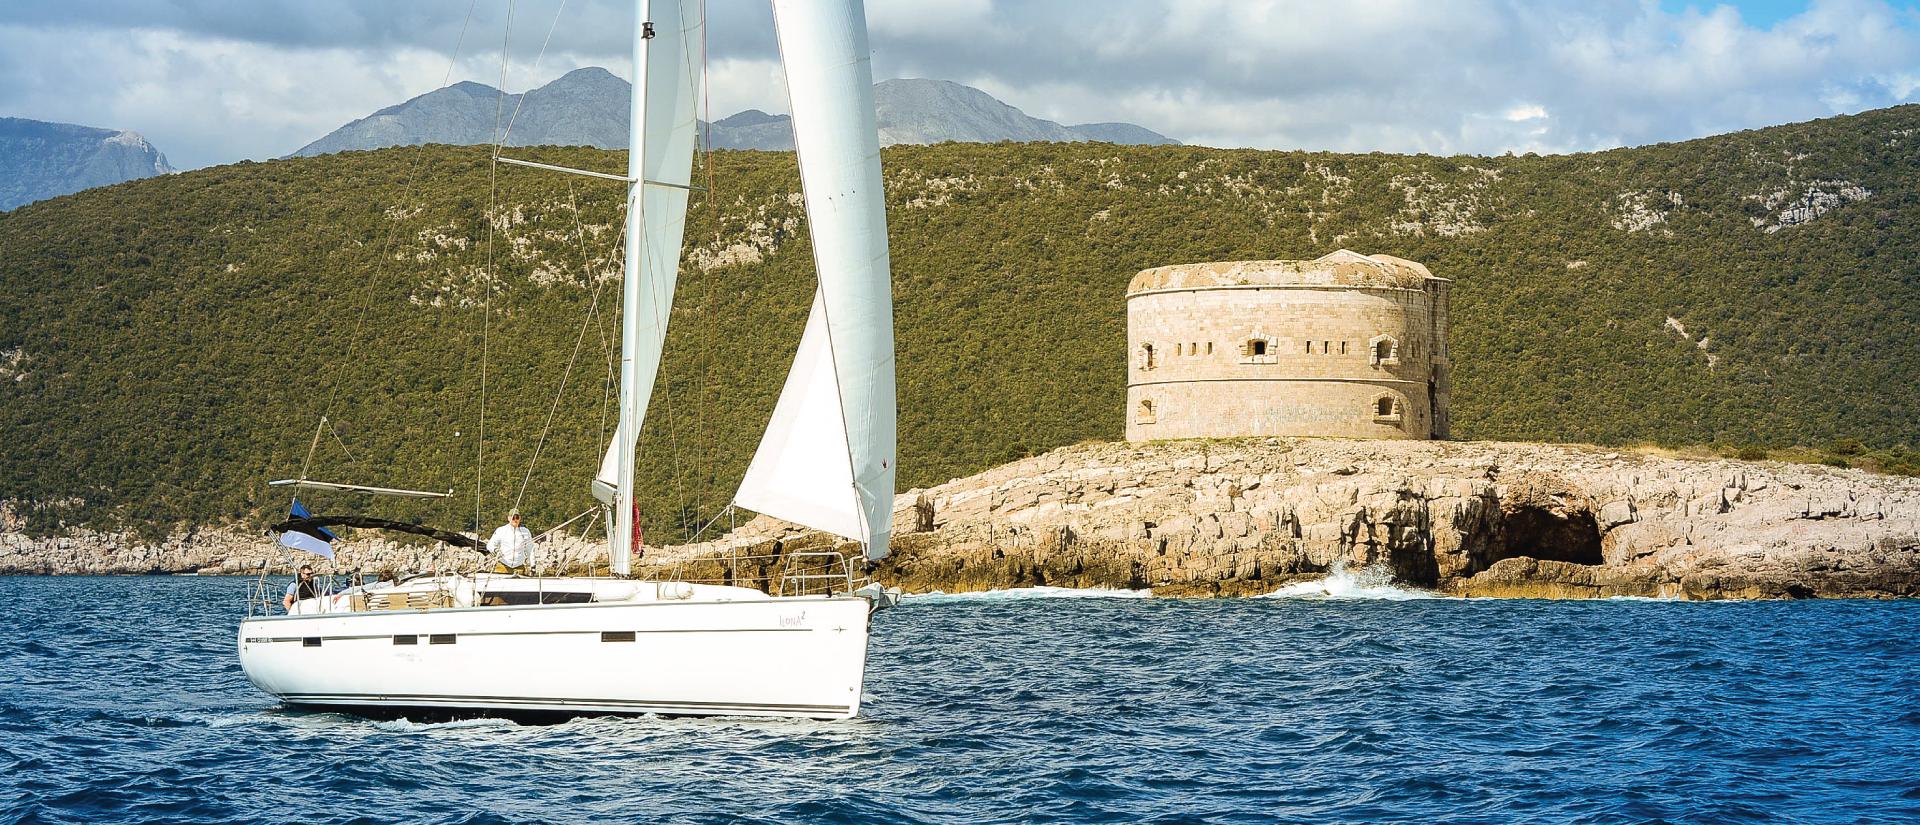 dreamsail.me-sailing-yacht-rent-montengro-bavaria